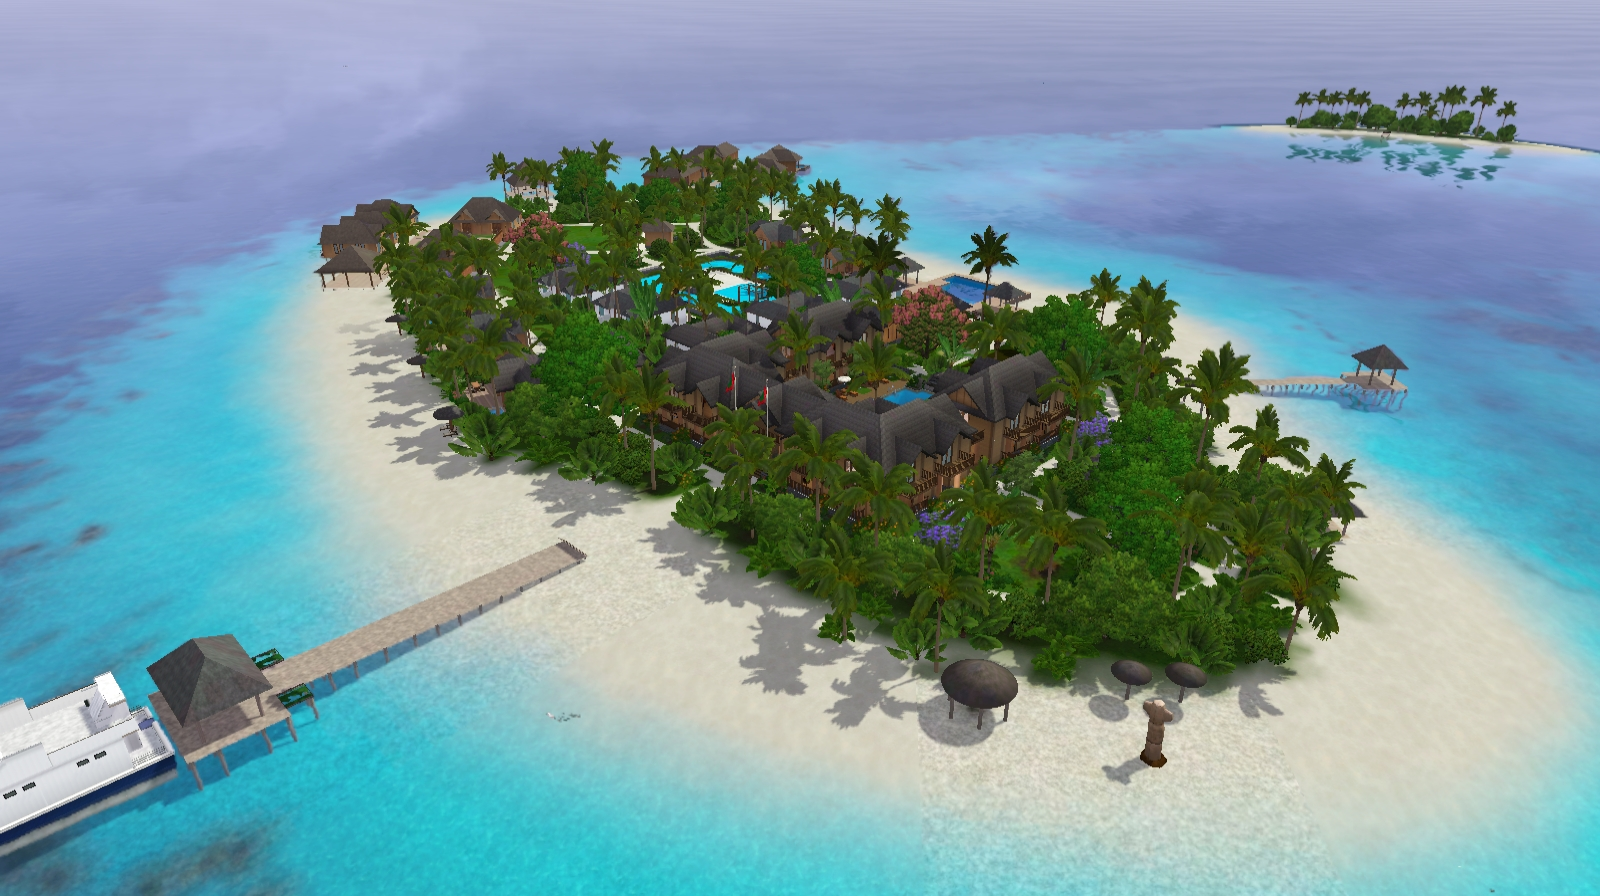 [Descarga] Mundo Suvadiva Resort, poblado. Screenshot-501